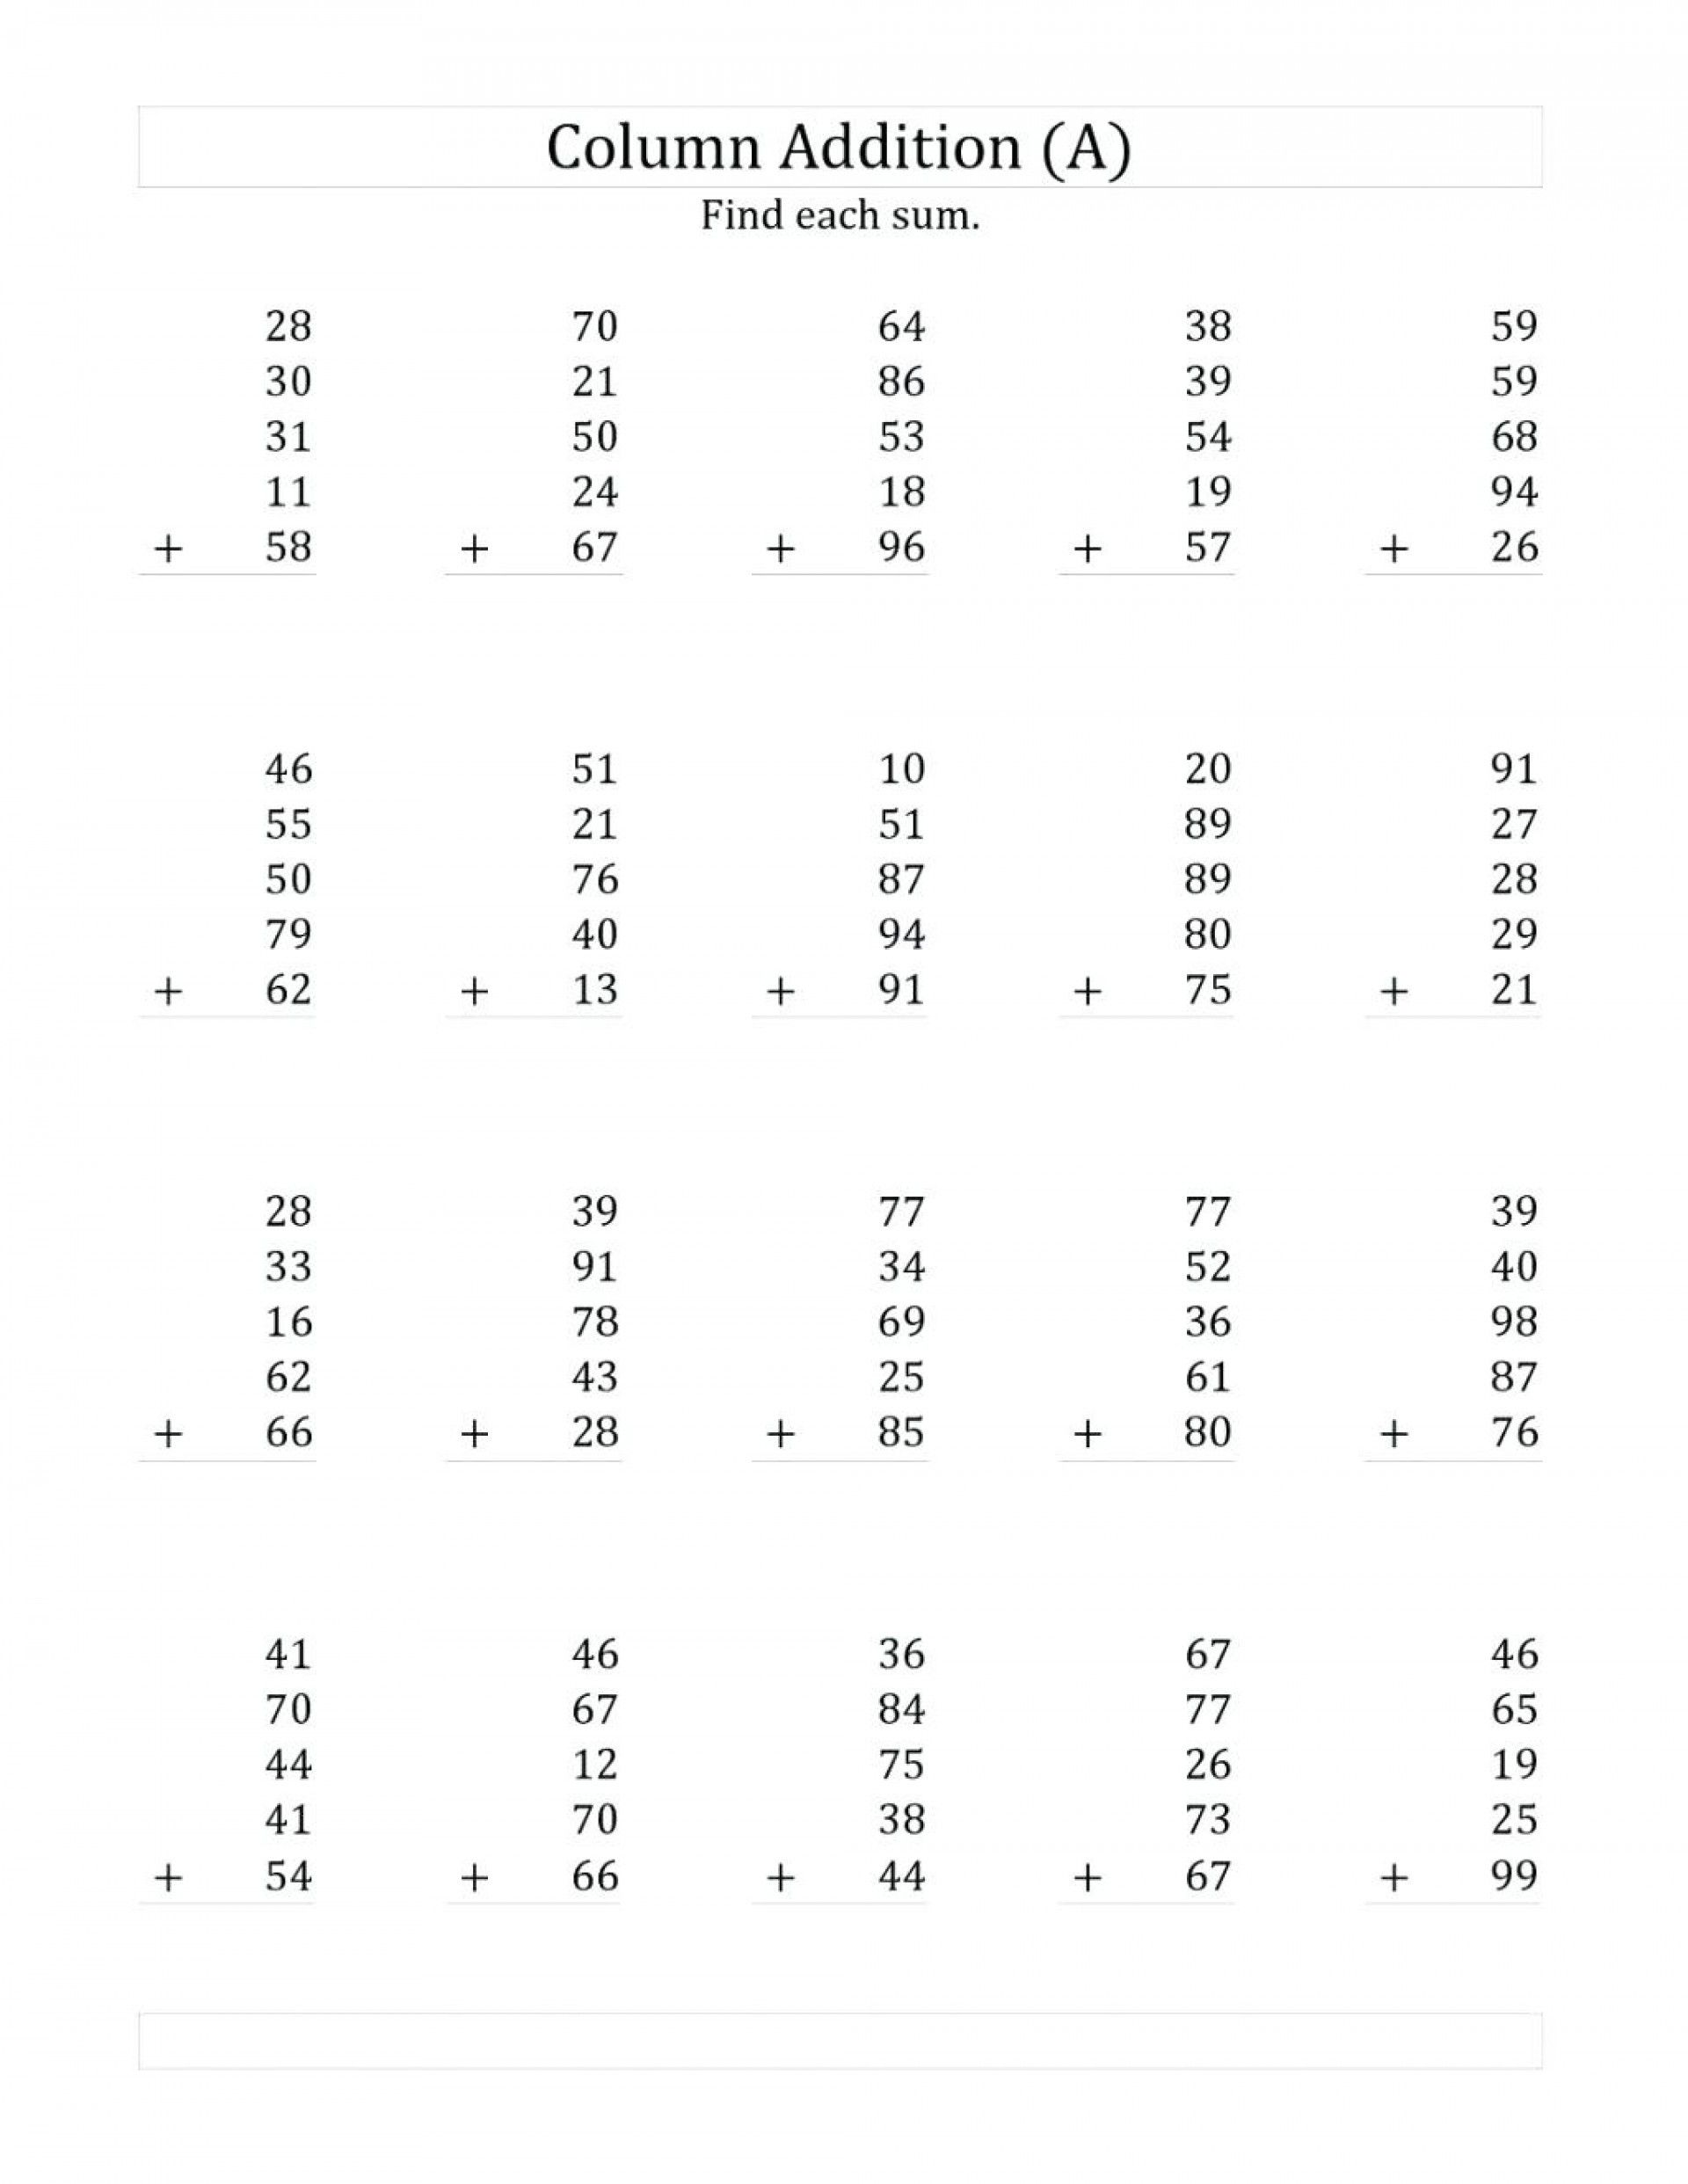 5 Free Math Worksheets Third Grade 3 Division Long Division Basic Facts 038 Worksheet Free Ma Free Math Worksheets Third Grade Math Worksheets Math Worksheets [ 2484 x 1920 Pixel ]